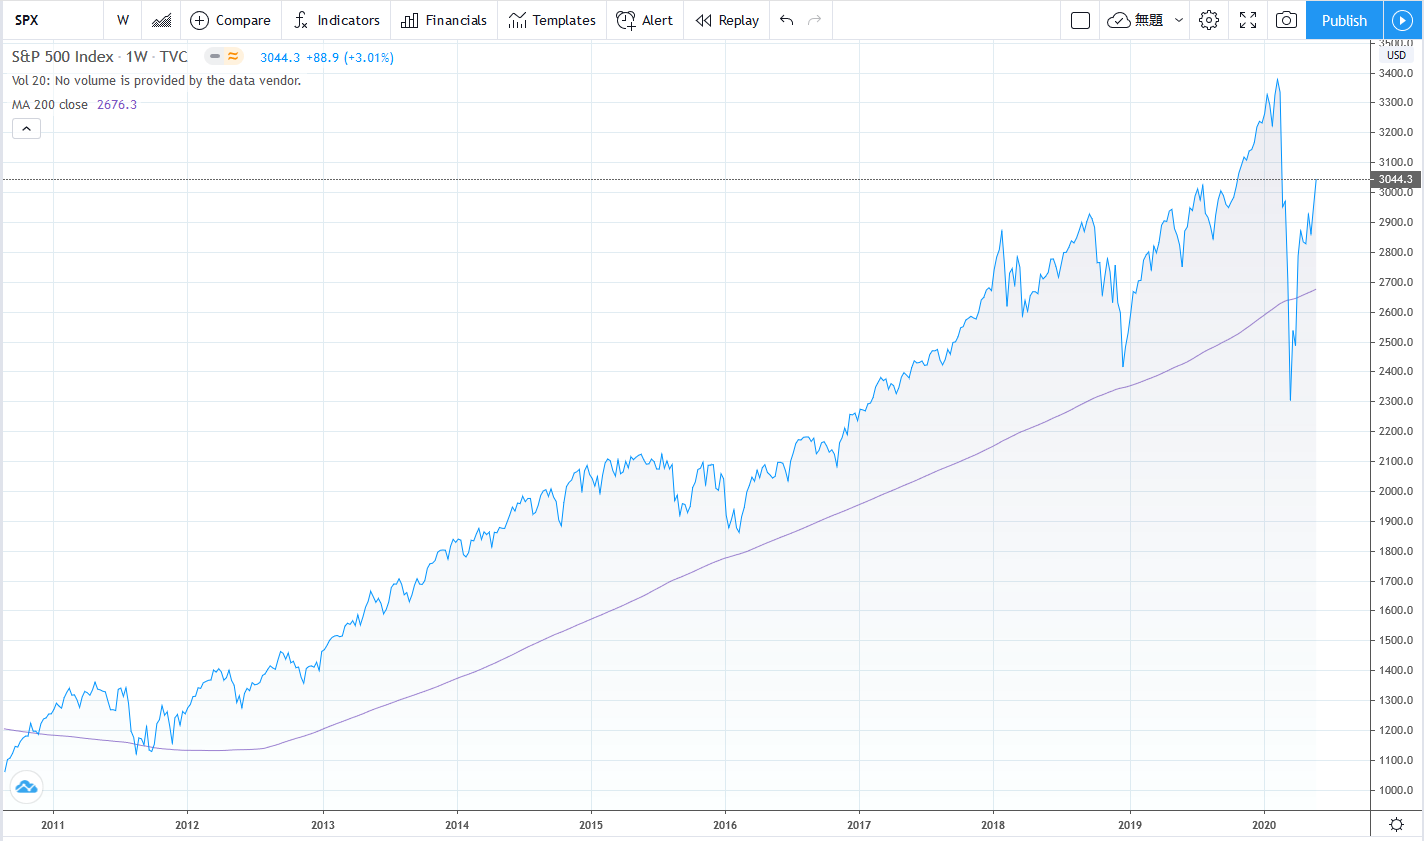 S&P500は既にコロナショック前の最高値から10%程度の下落水準まで回復